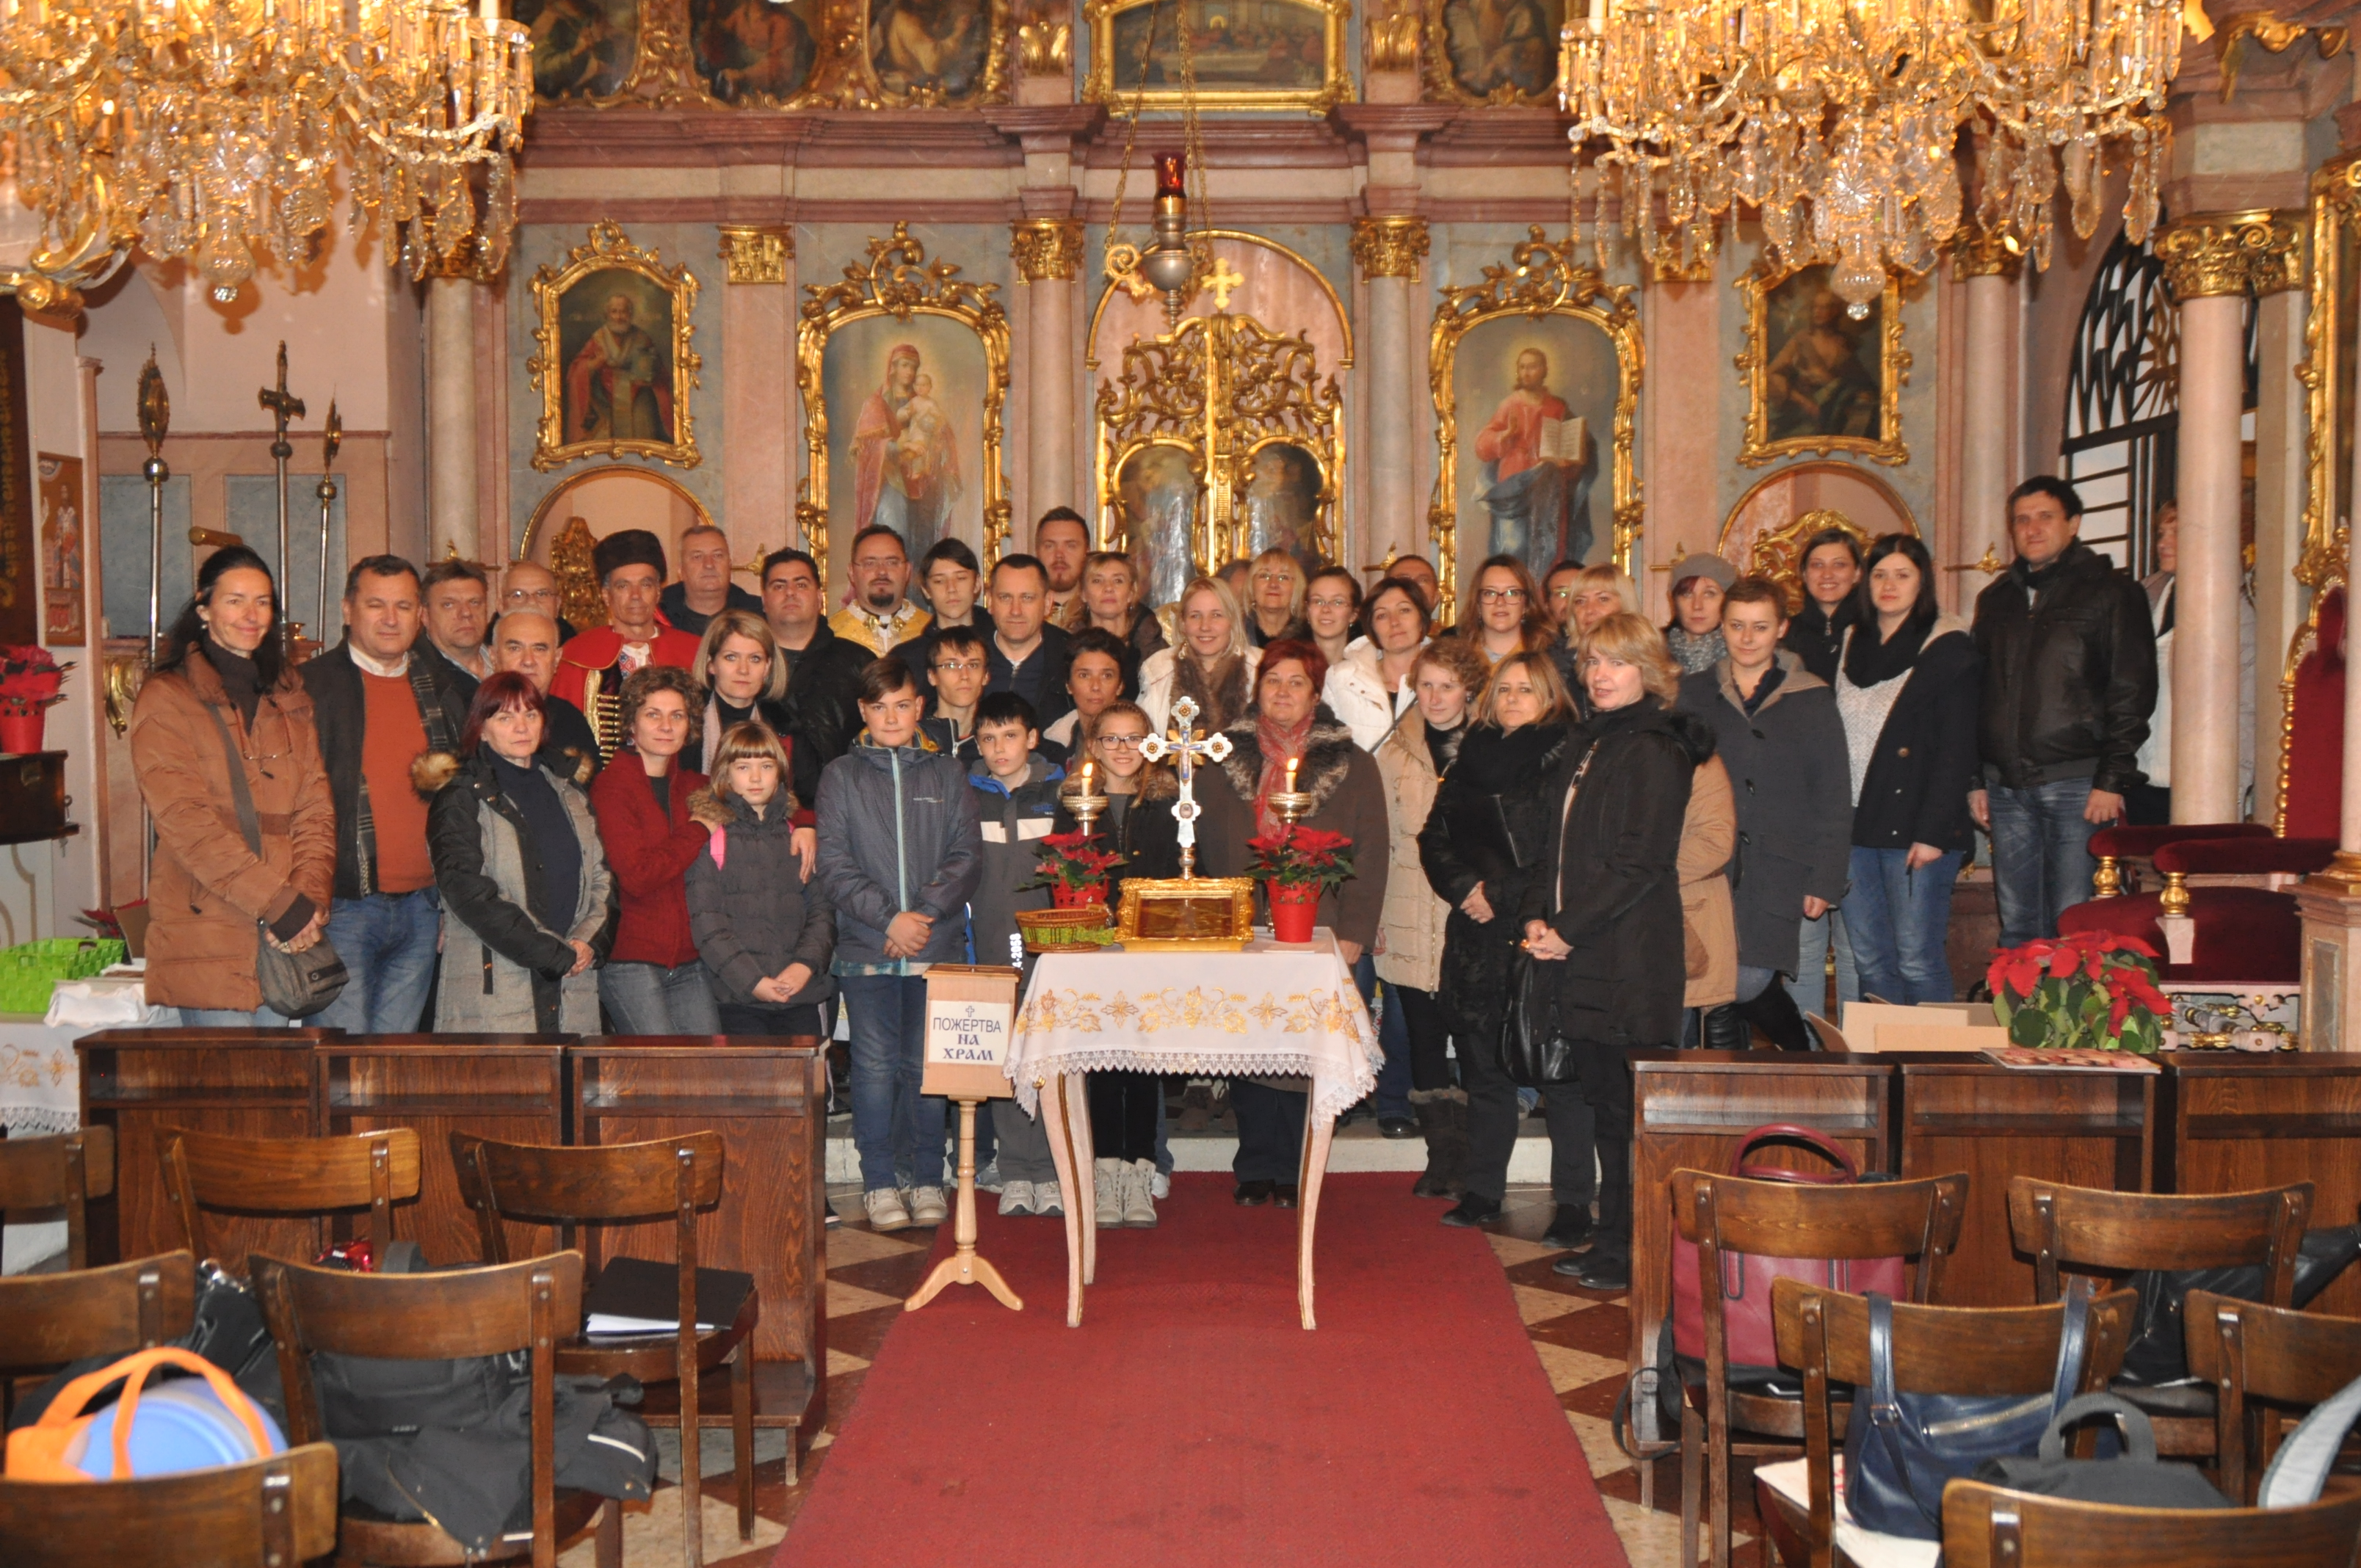 zborovi-u-becu-hpd-kalnik-katedralni-zbor